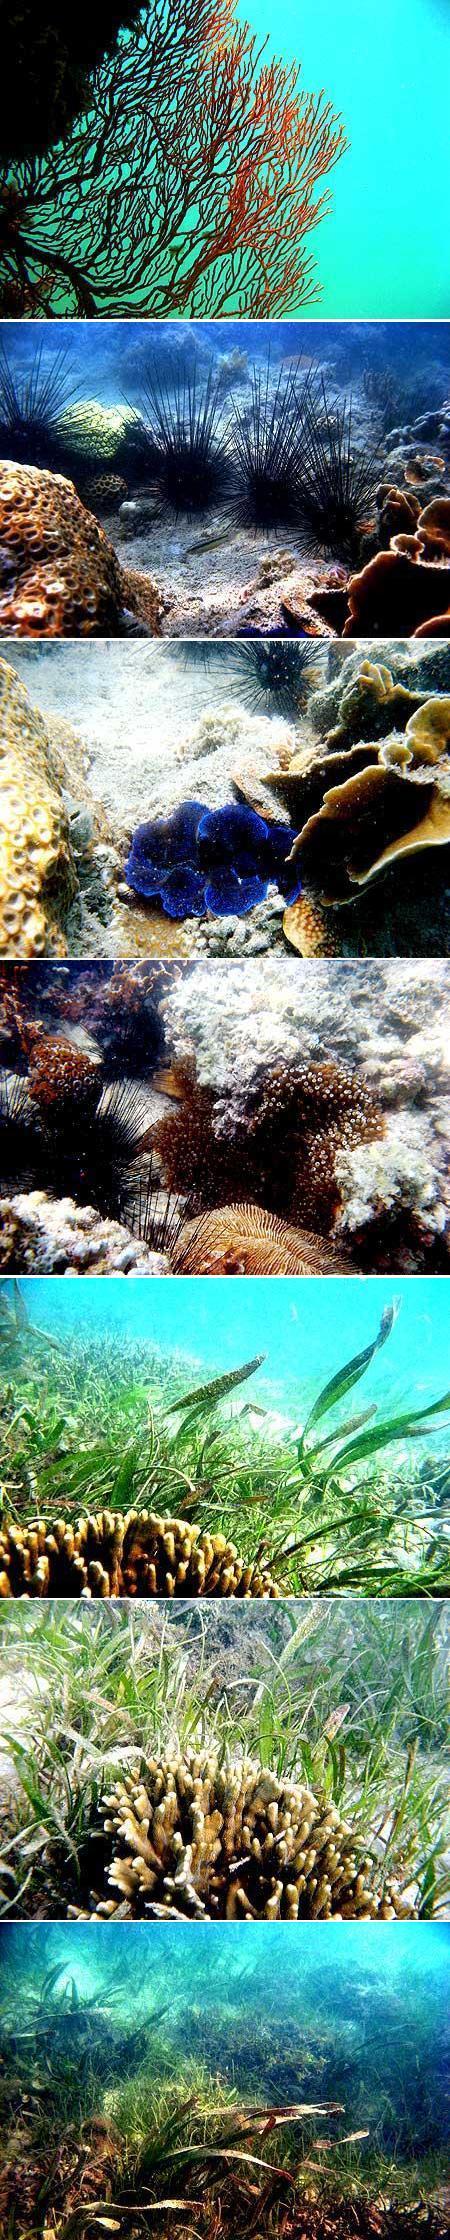 Terumbu karang (coral reef), padang lamun (seagrass bed), bulu babi (diaderma sp.), dan makro alga di pulau Ketawai, Bangka, yang kurang baik